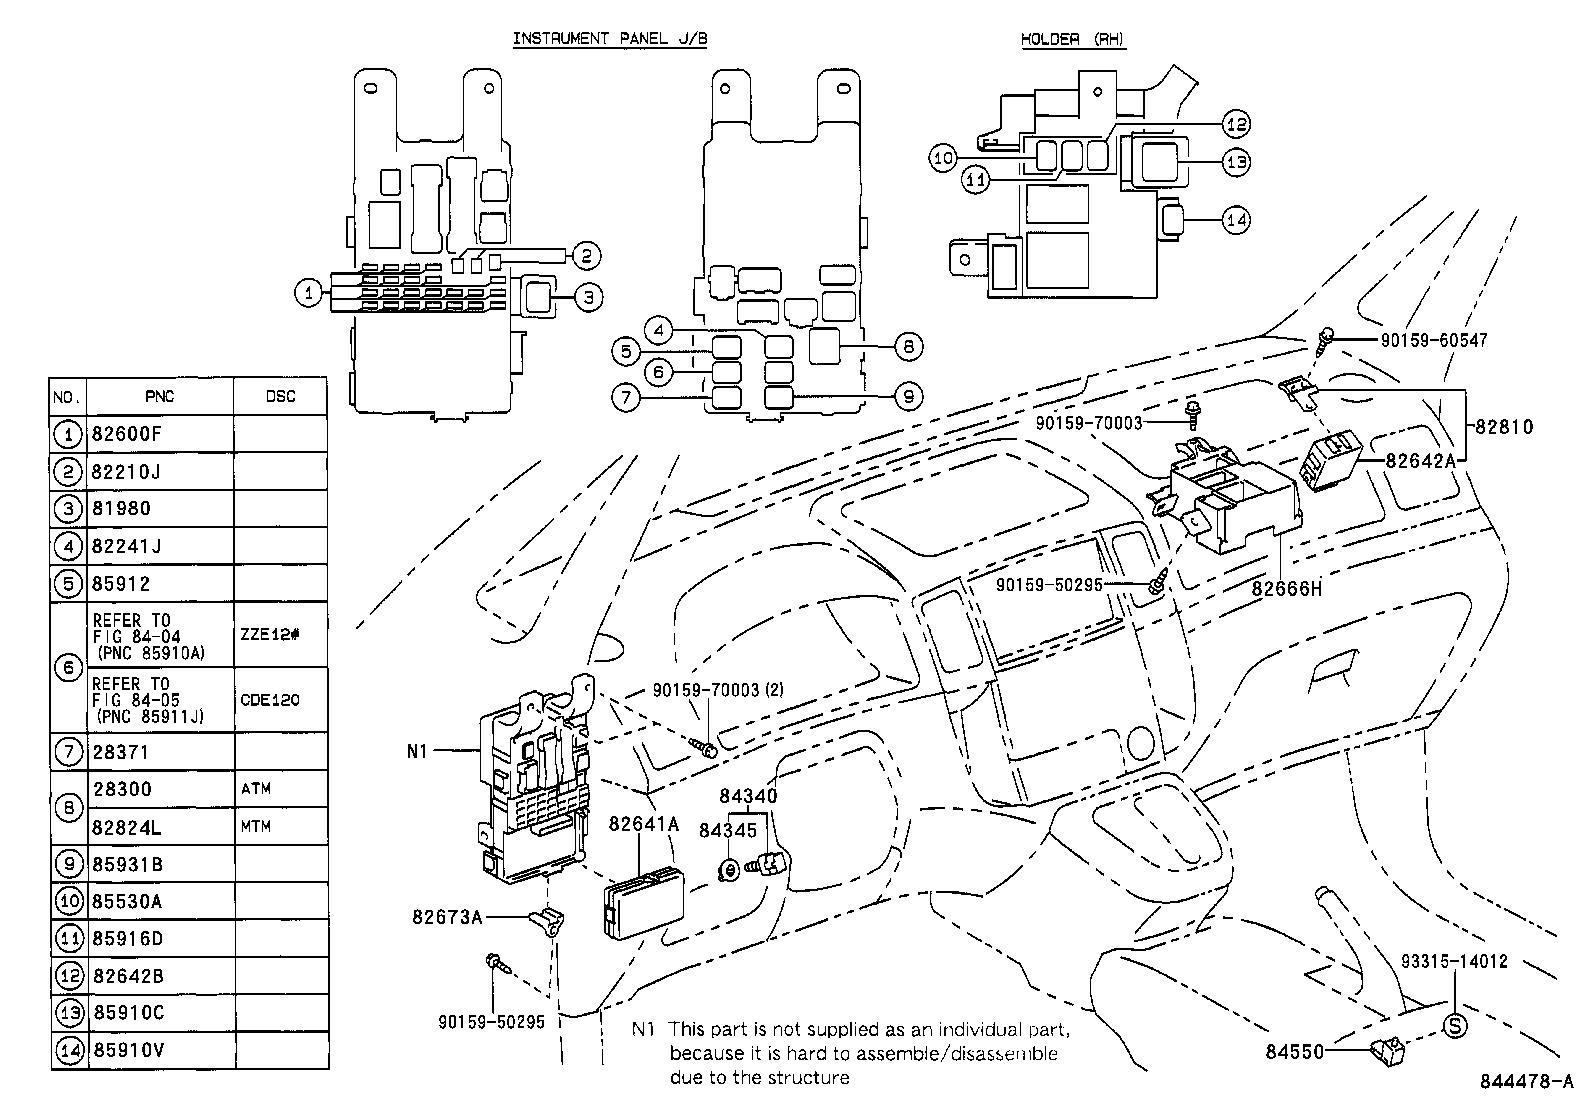 toyota corolla versozze122l-fwmnkw - electrical